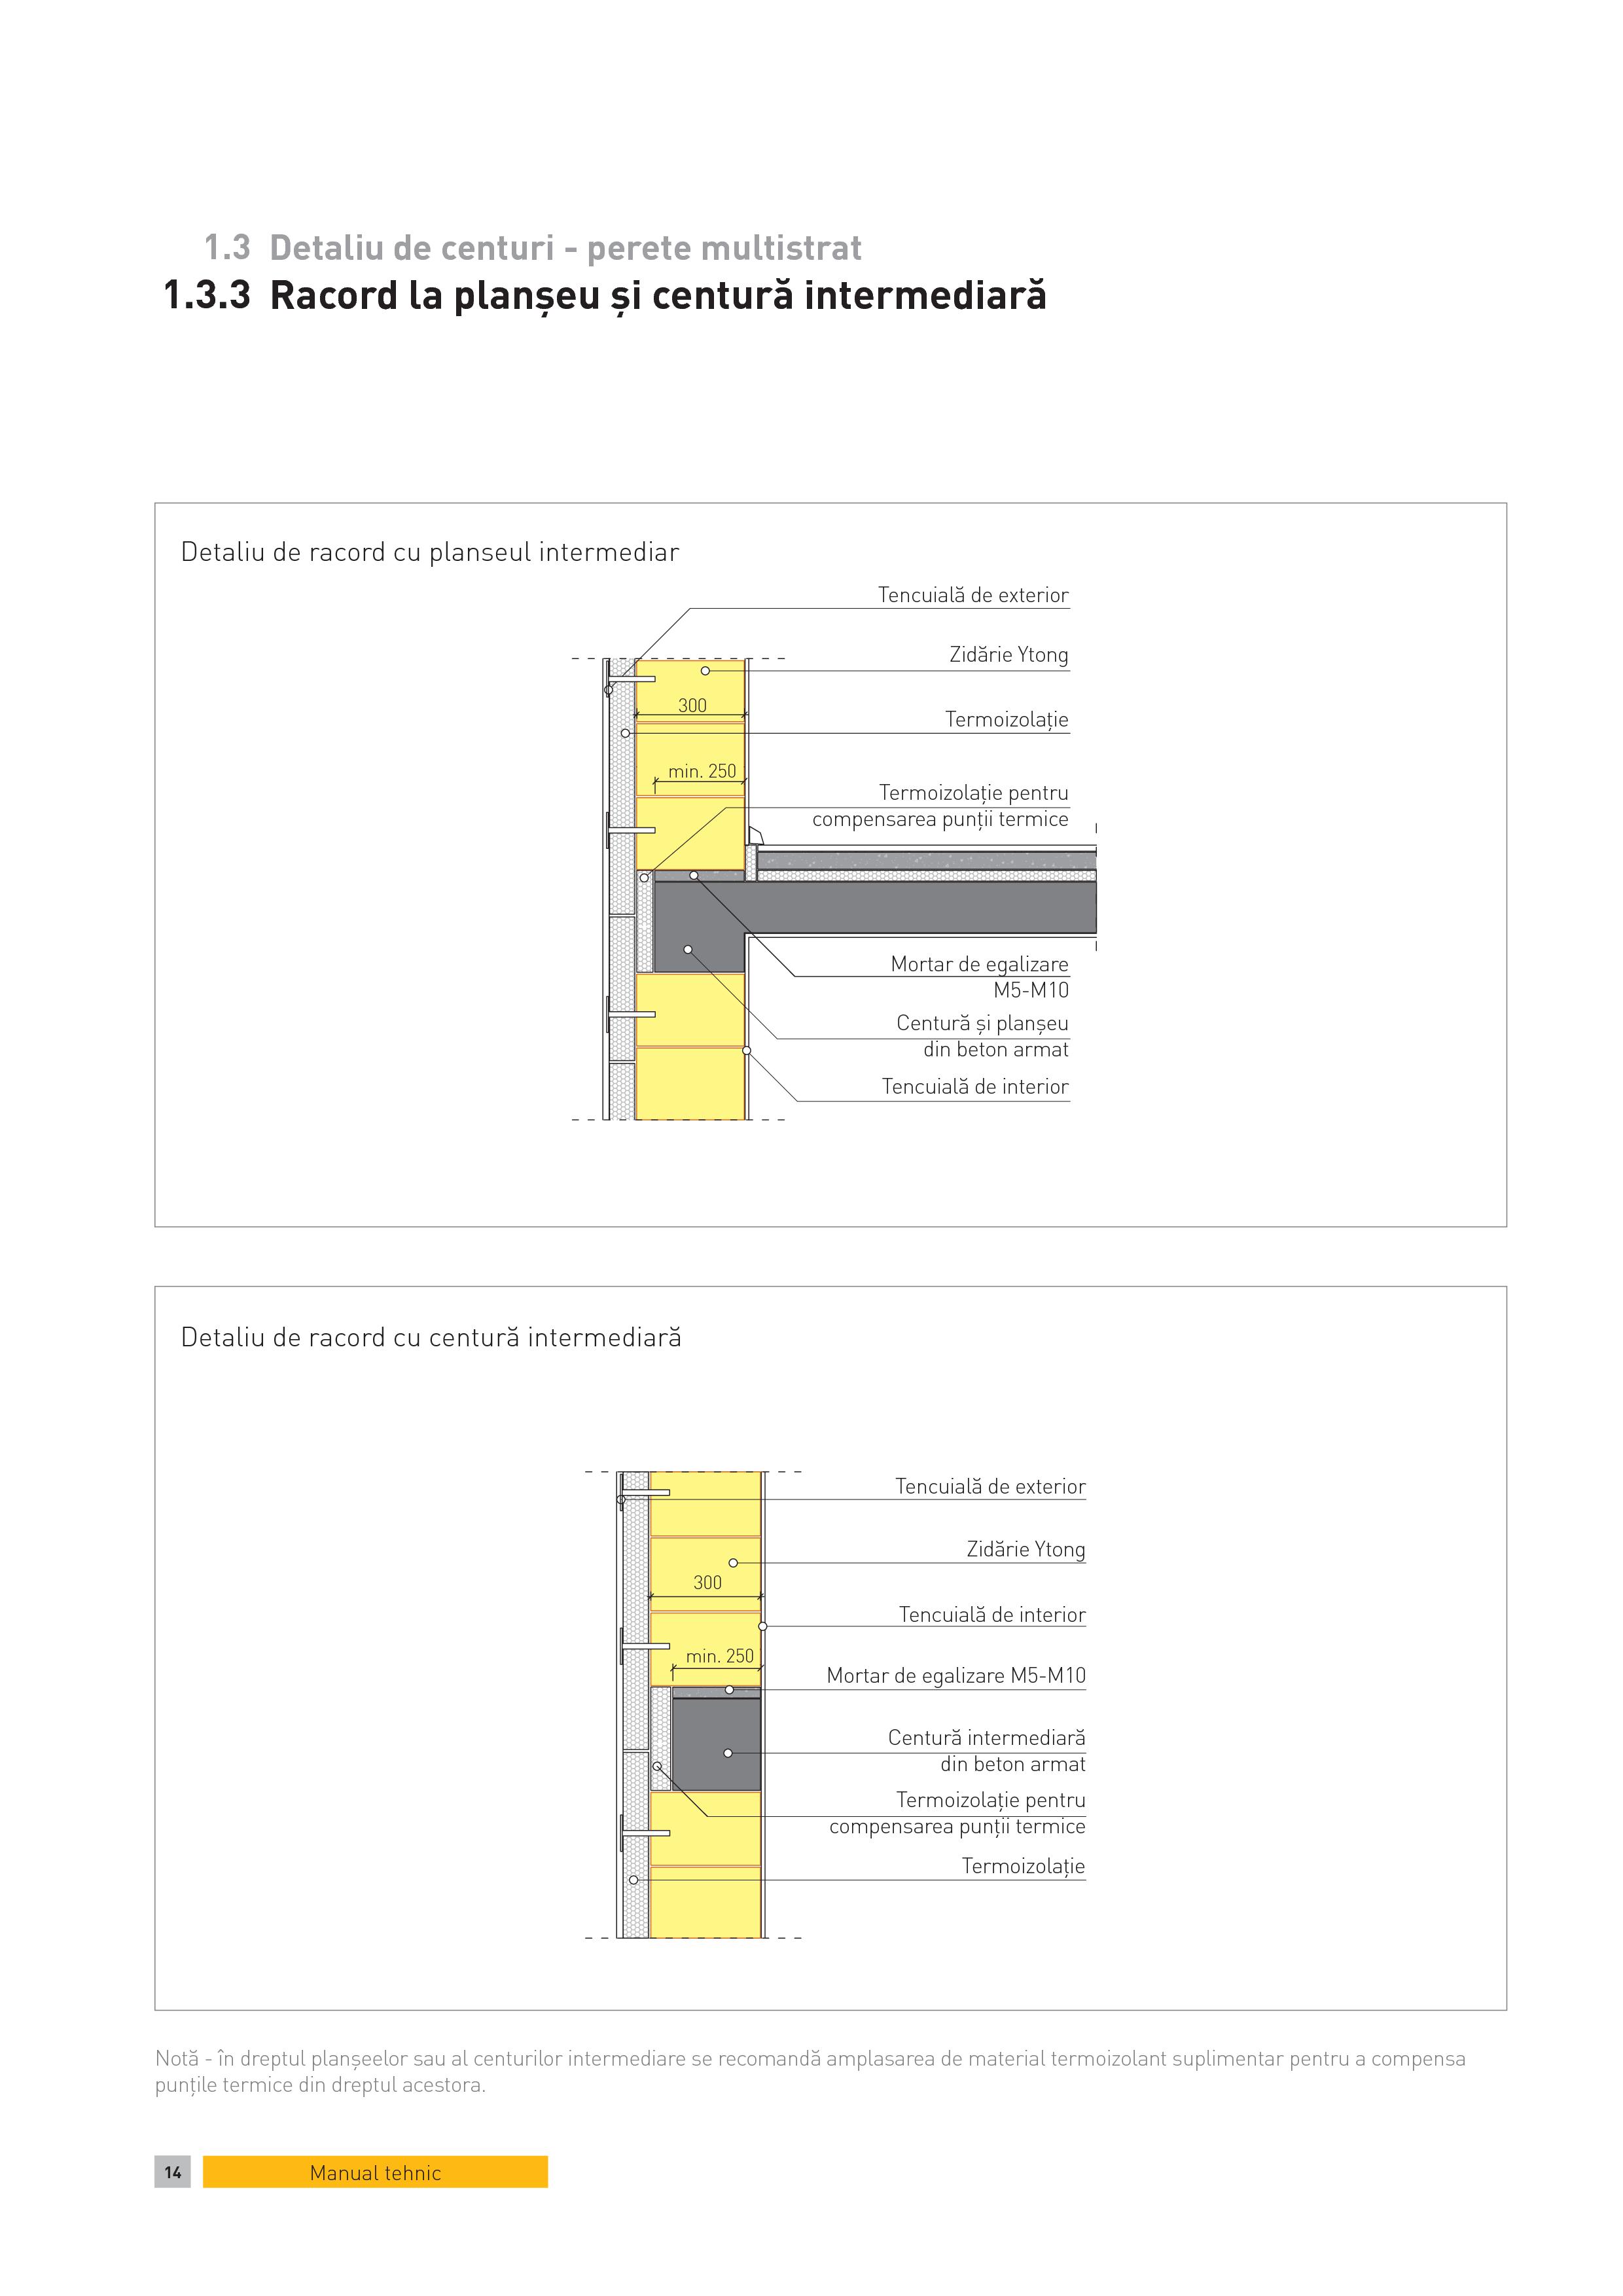 Pagina 1 - CAD-PDF Detaliu de centuri - perete multistrat. Racord la planseu si centura intermediara...